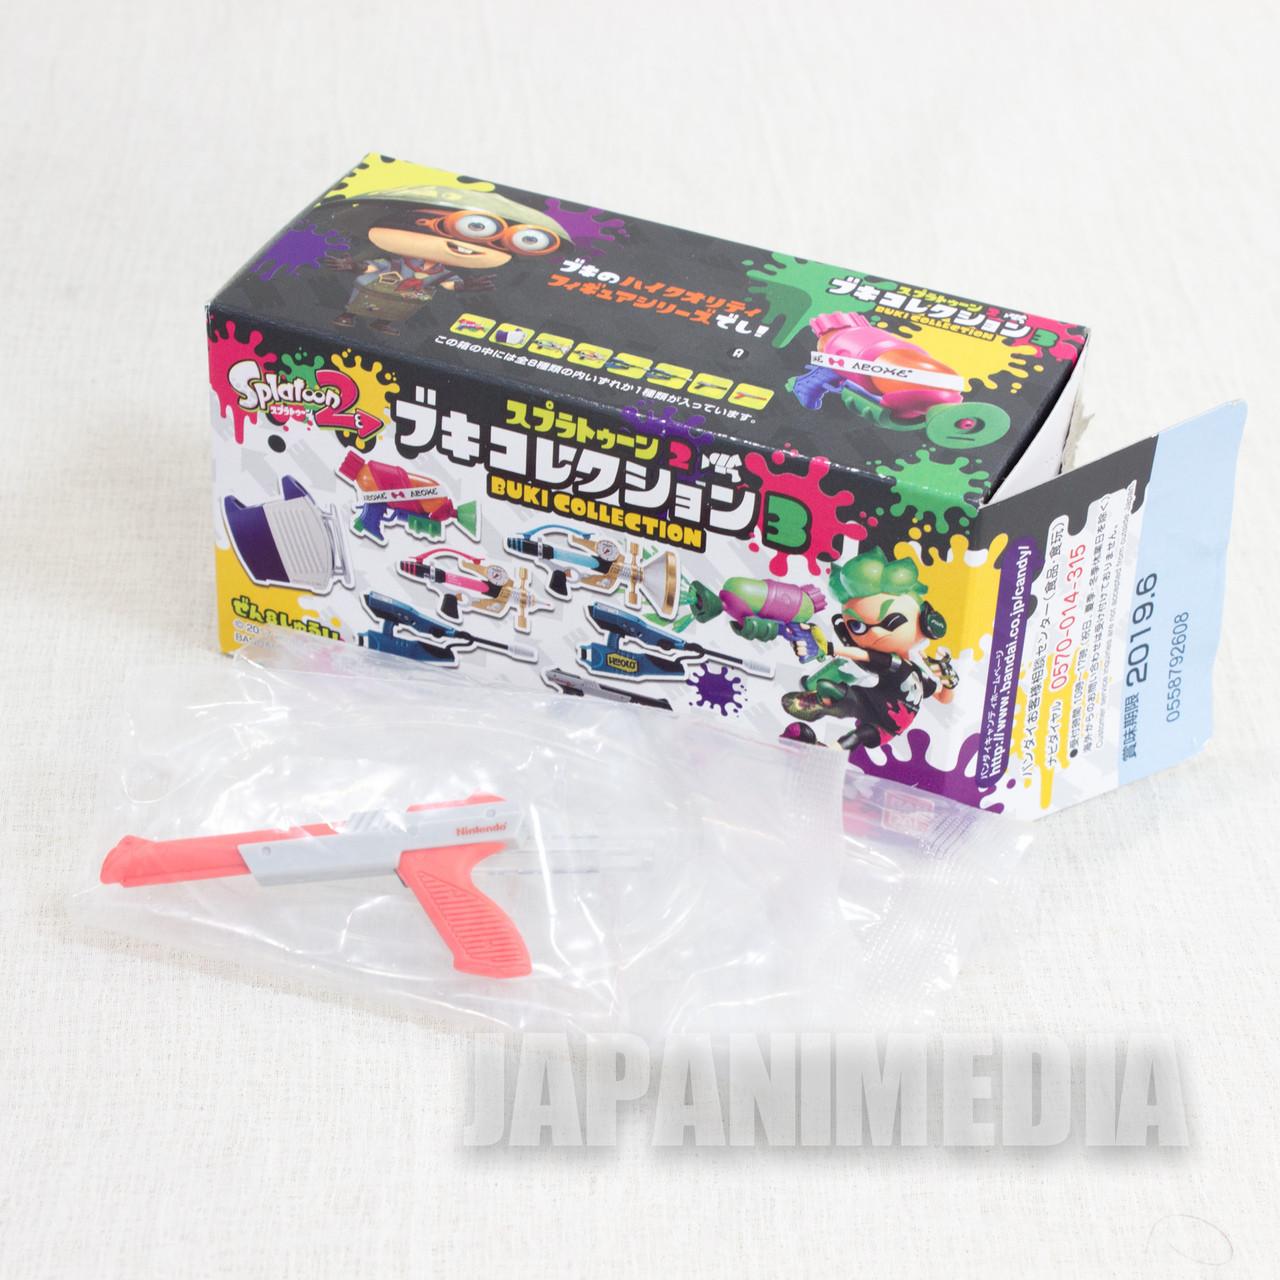 Splatoon 2 N-ZAP '89 Weapon Figure Collection JAPAN Nintendo Switch